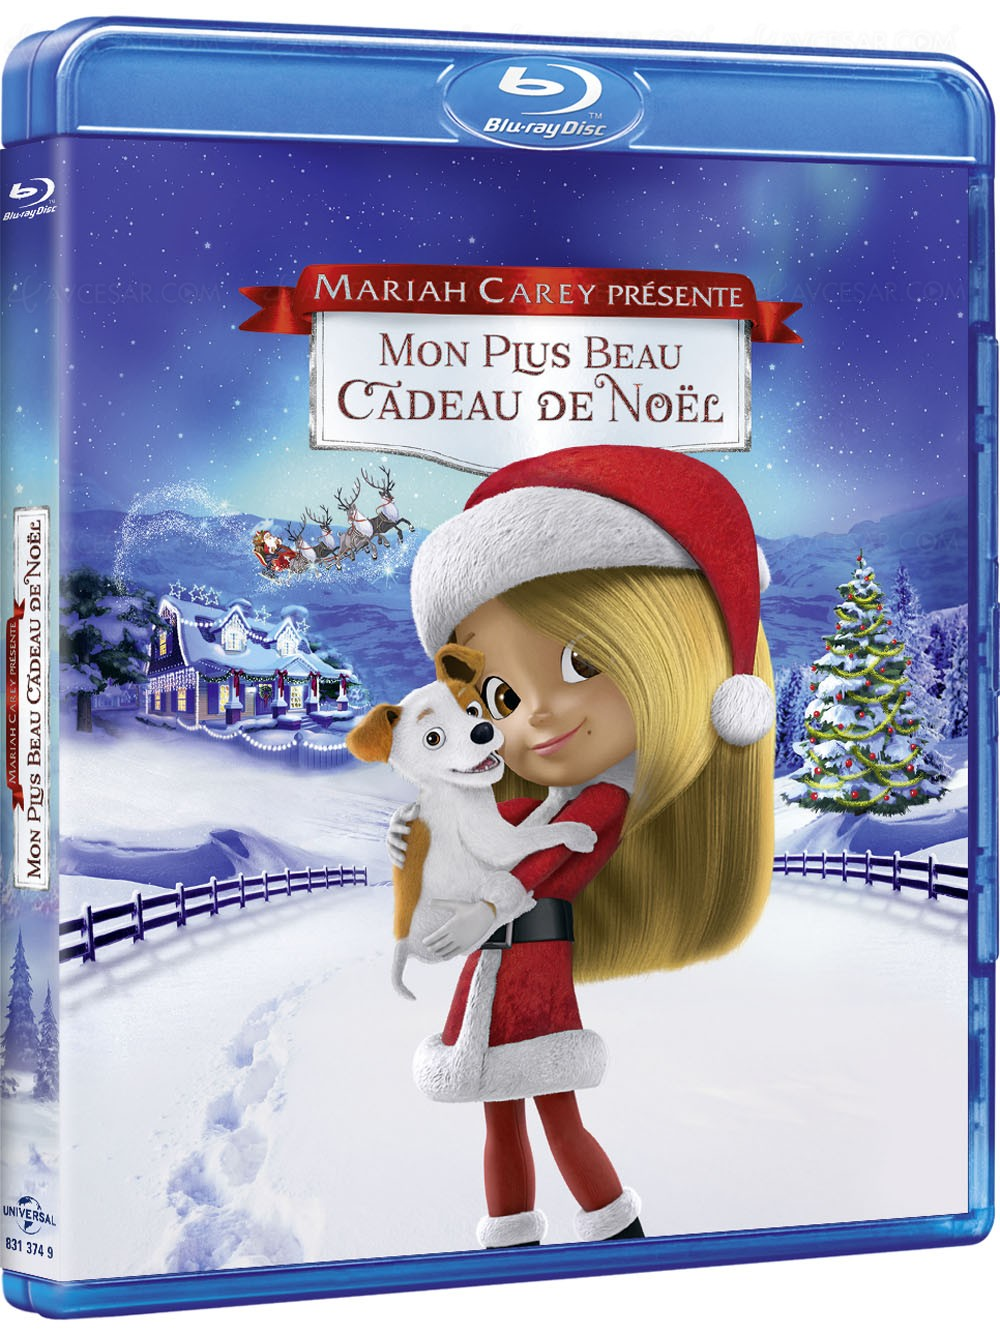 Mon Plus Beau Cadeau De Noël Mariah Carey Adapte Sa Chrismas Song